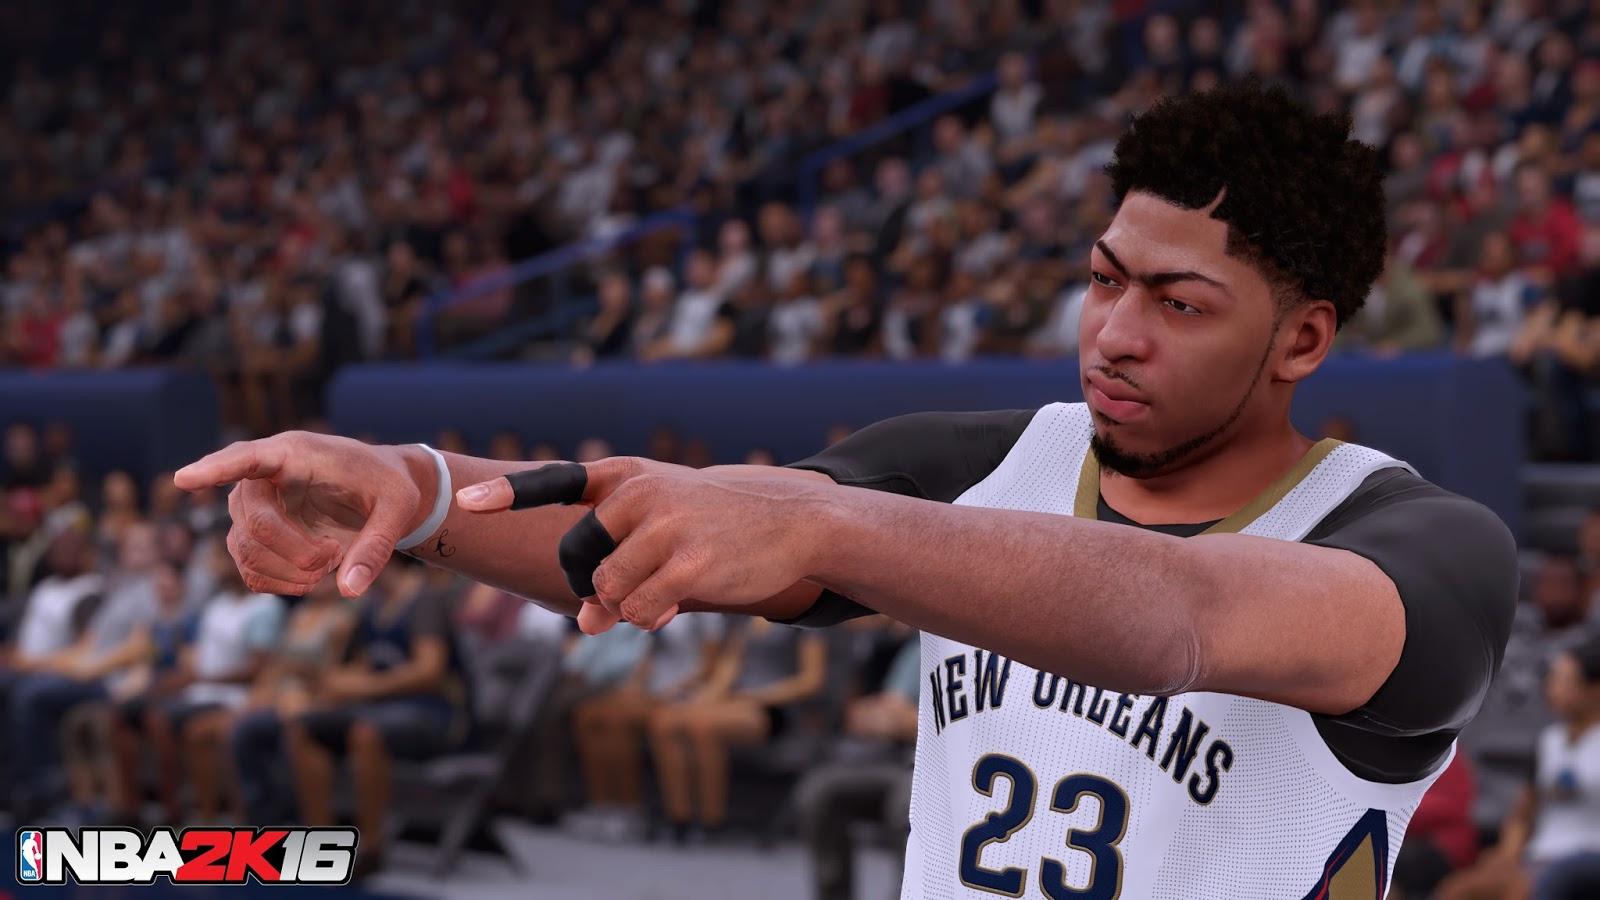 NBA 2K16 4K Screenshots - Stephen Curry, Anthony Davis & James Harden